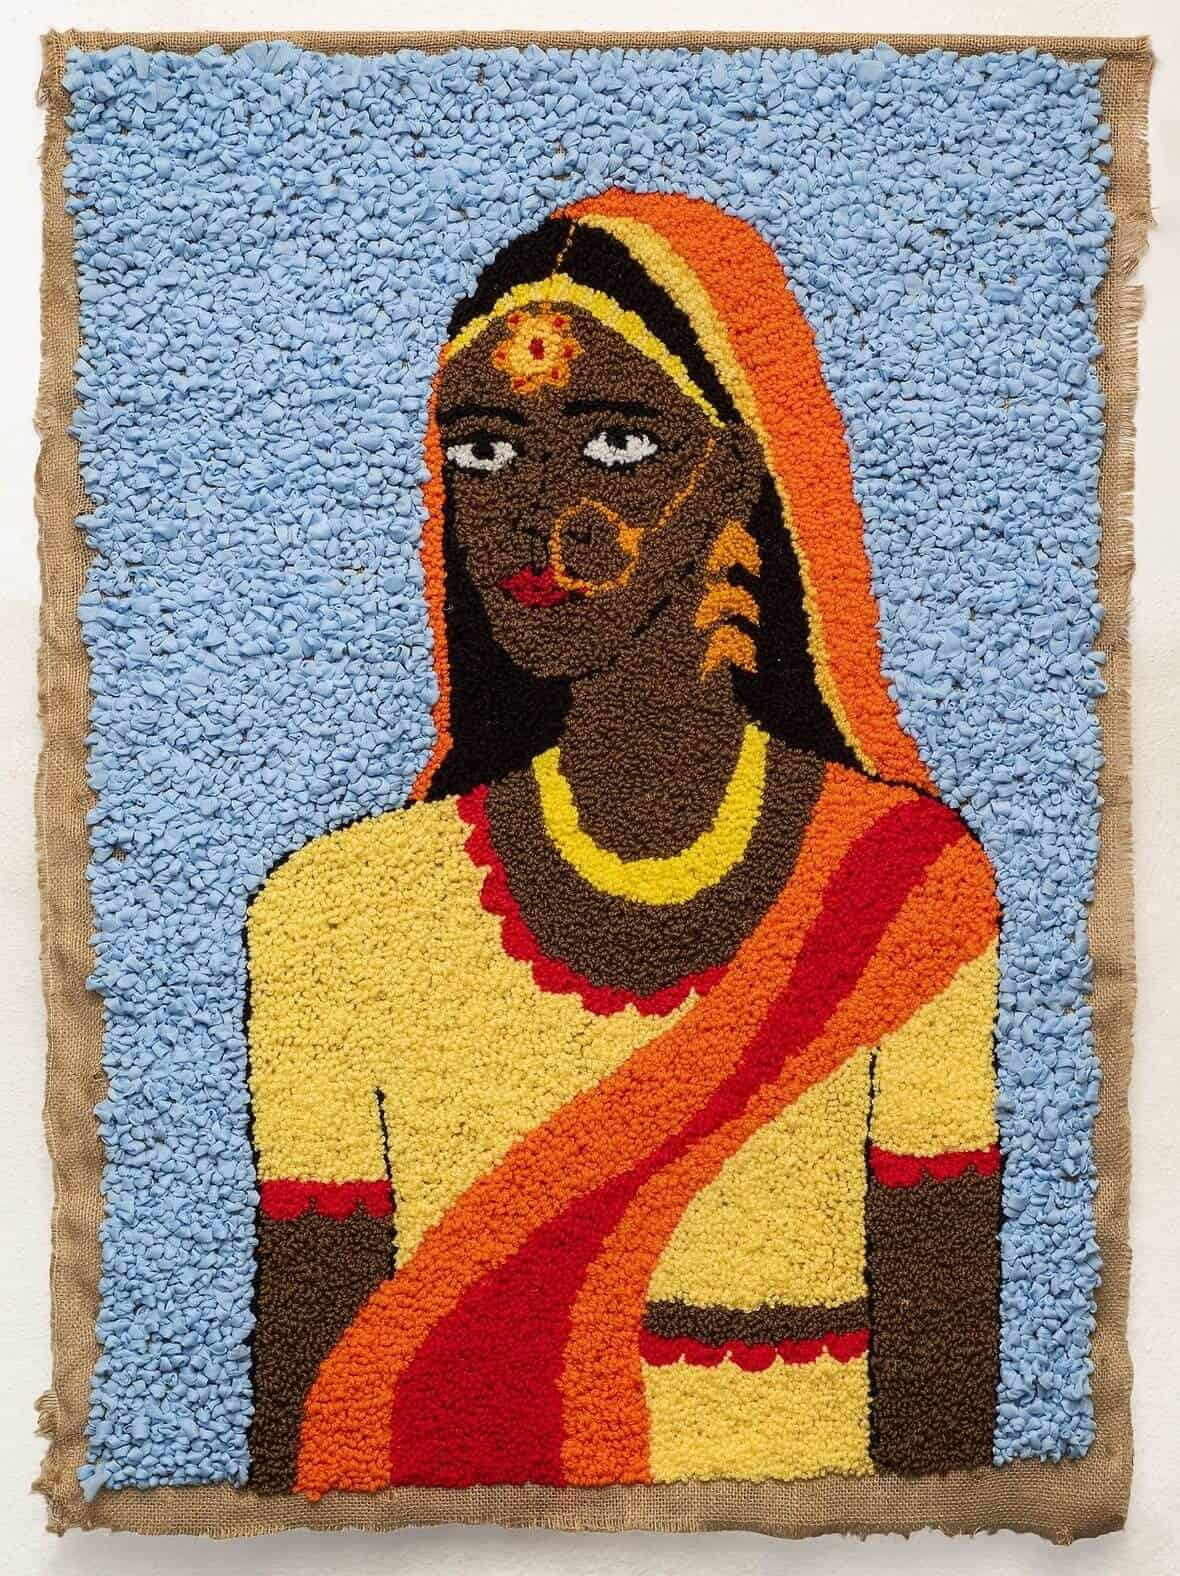 Talia Ramkilawan, Untitled III, 2019. Immagine per gentile concessione di SMITH & FNB Art Joburg.